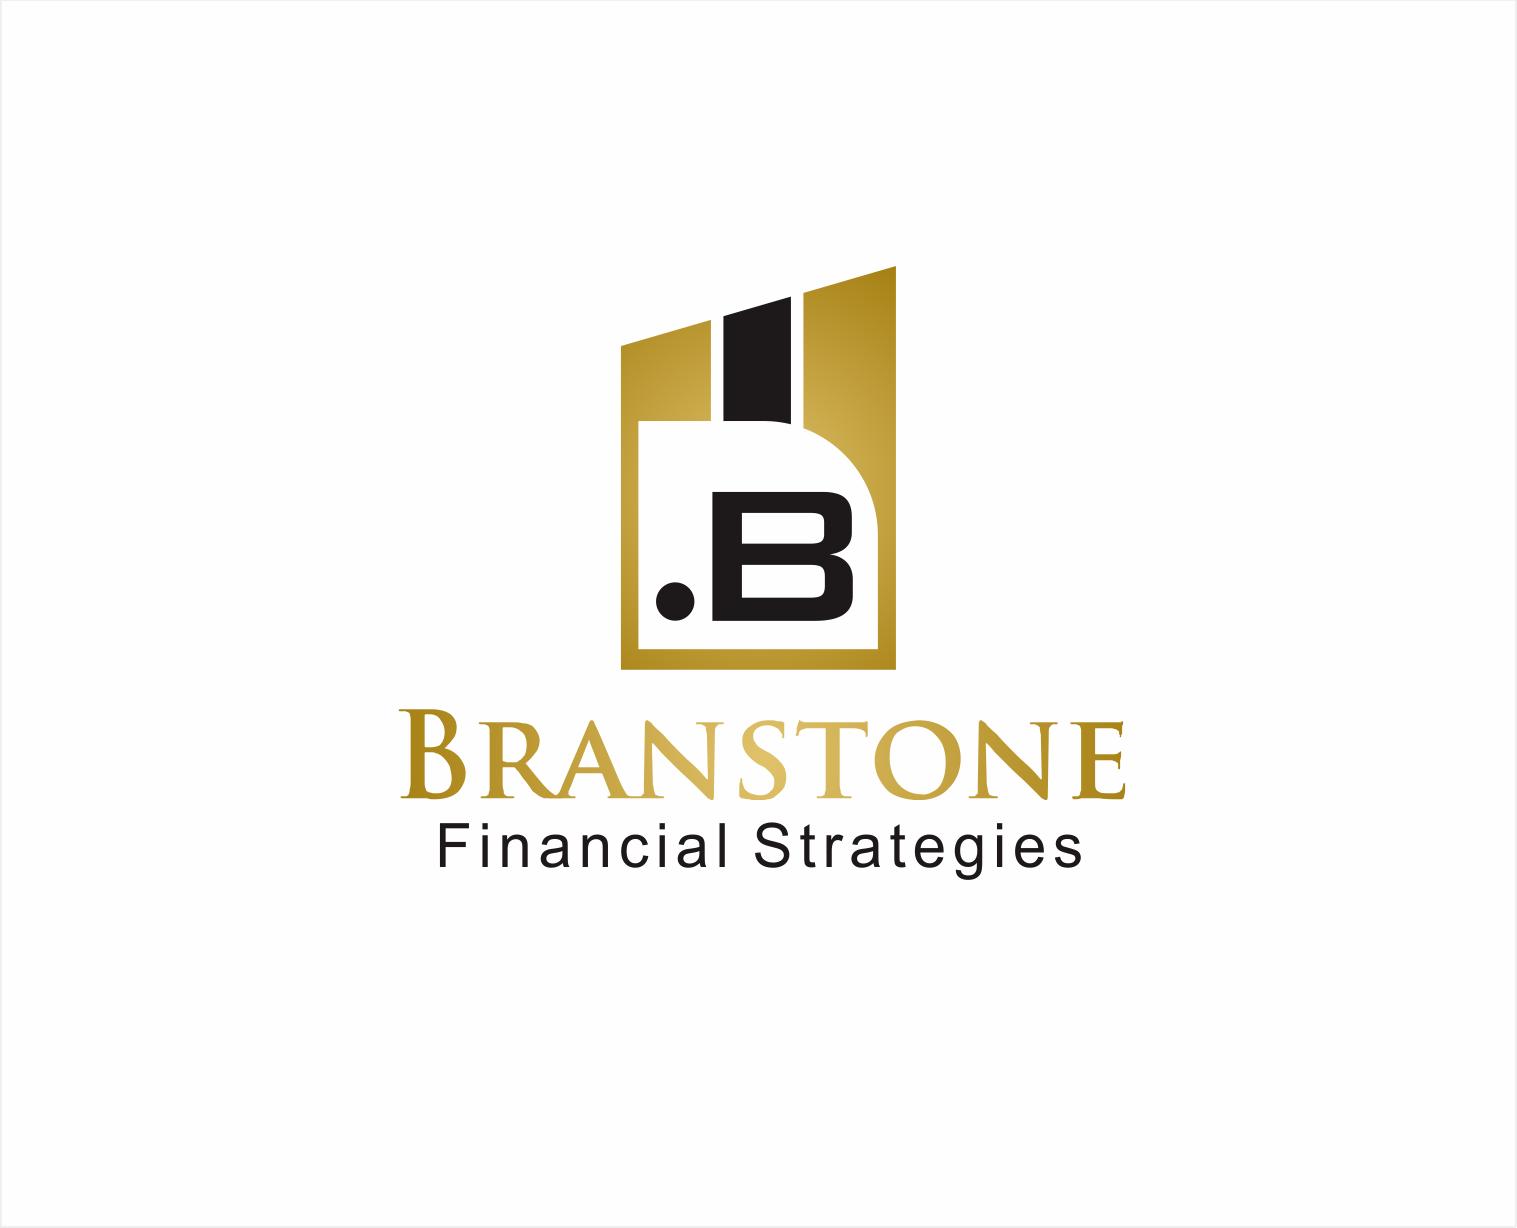 Logo Design by Armada Jamaluddin - Entry No. 234 in the Logo Design Contest Inspiring Logo Design for Branstone Financial Strategies.